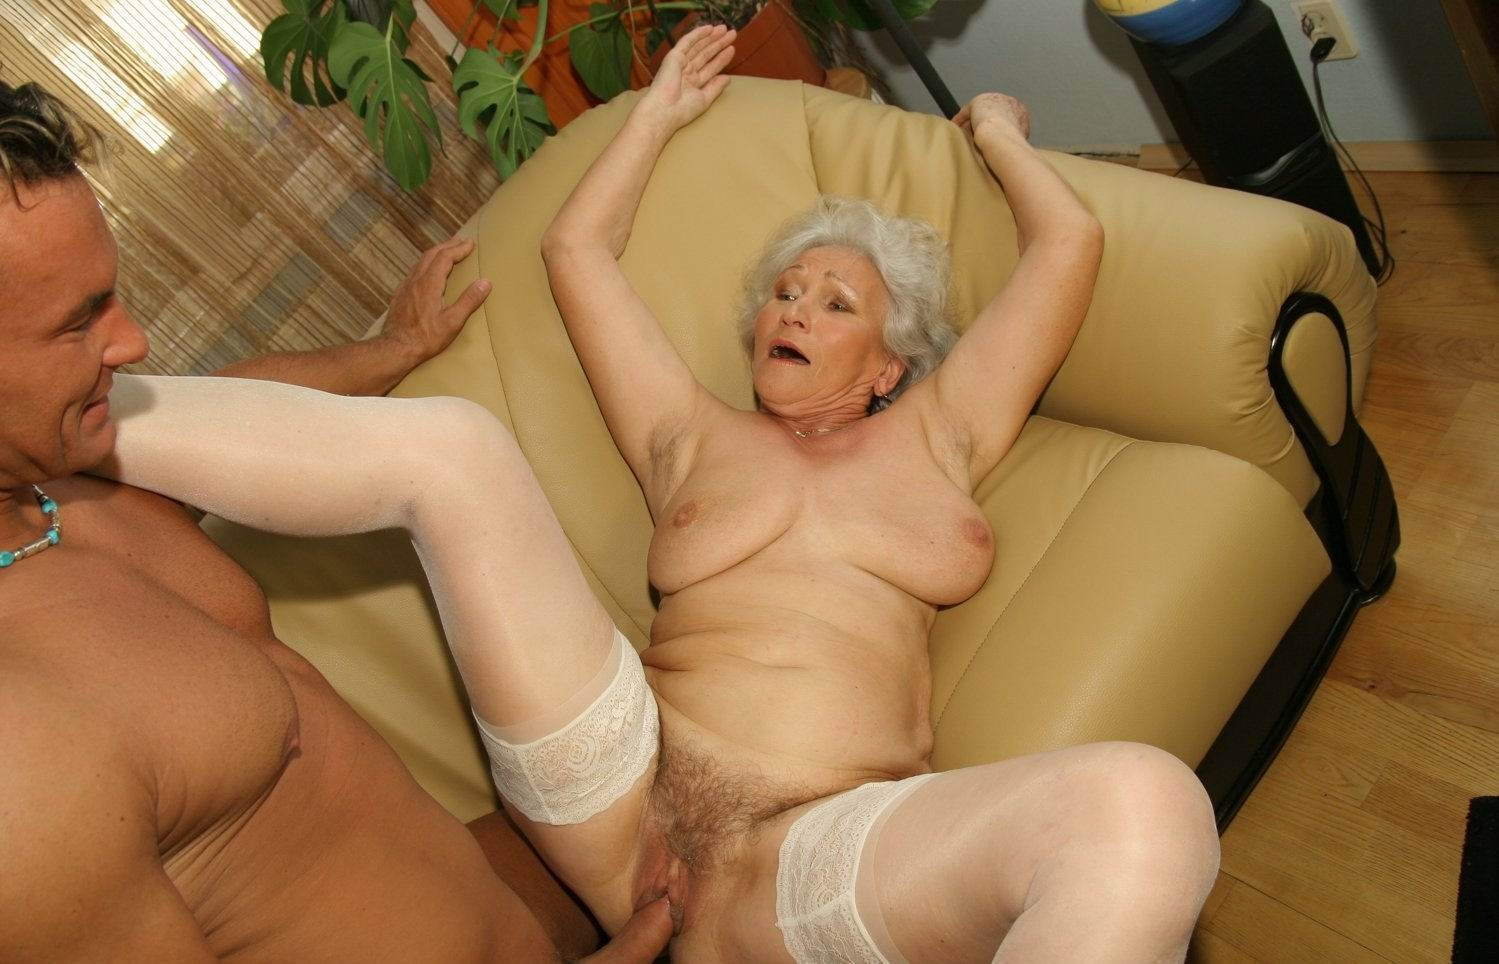 viejasfollando porno morenas